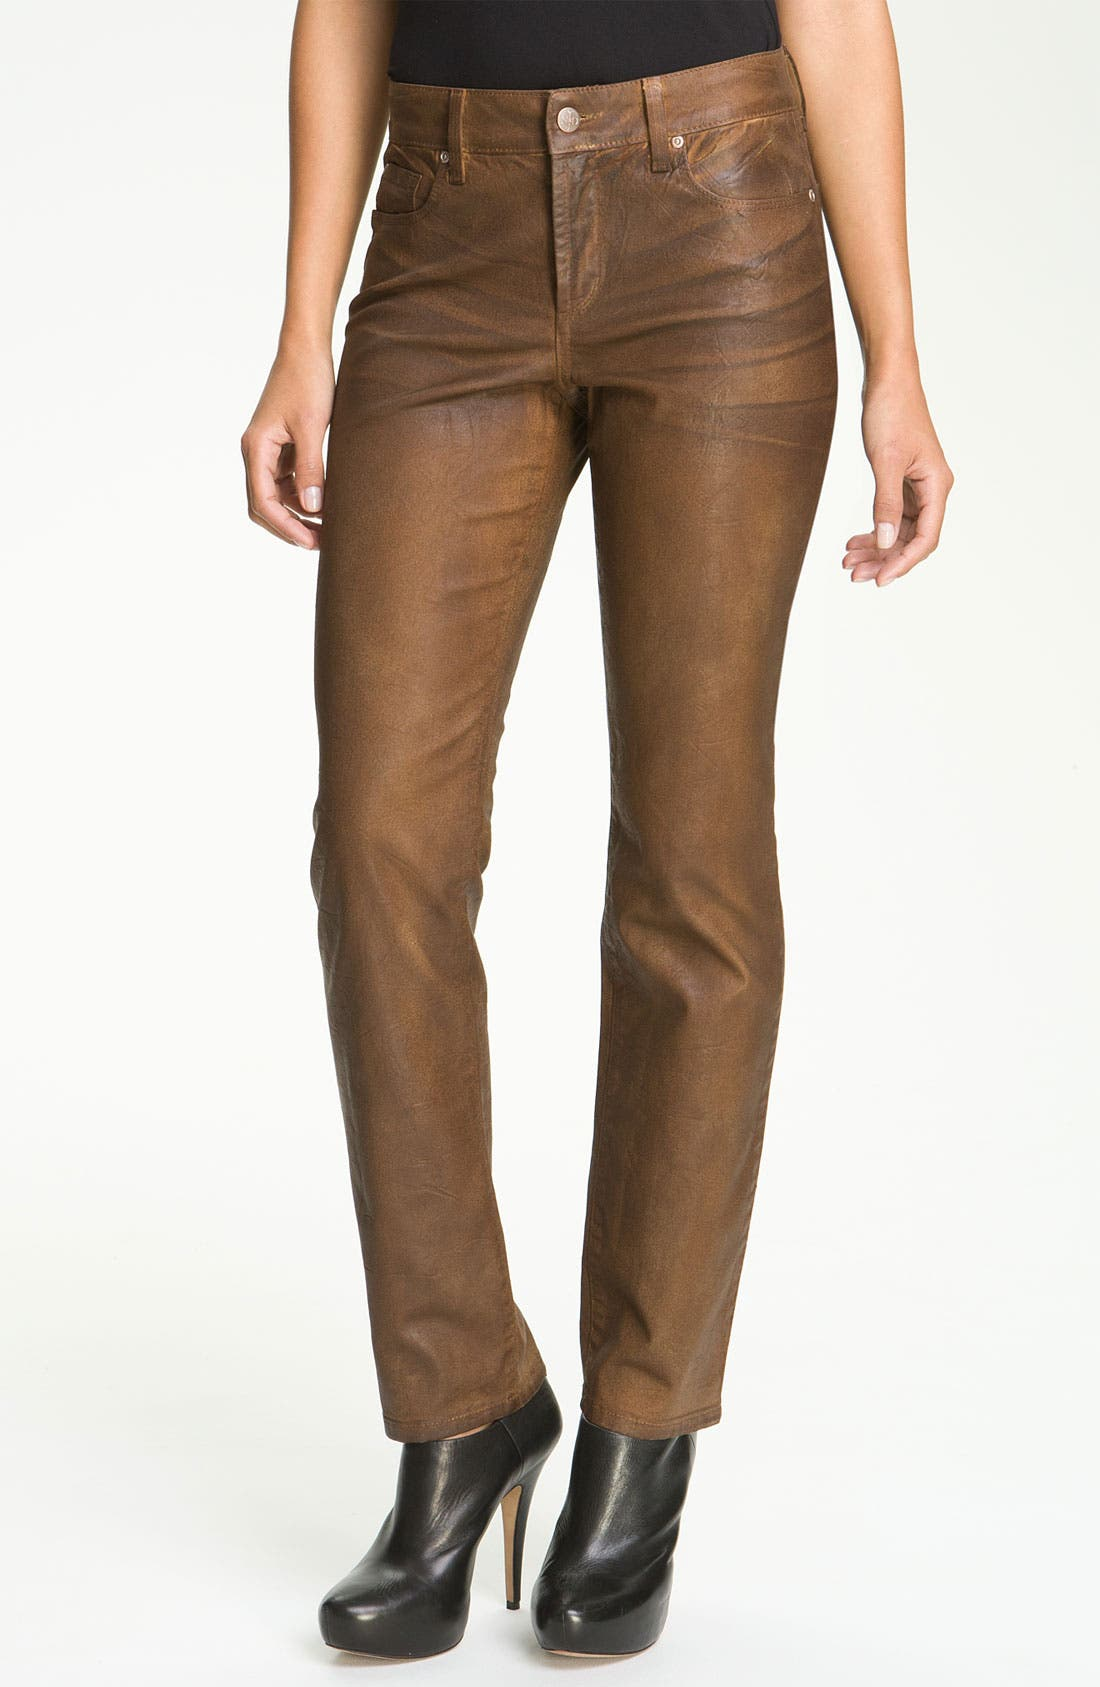 Alternate Image 1 Selected - NYDJ 'Sheri' Coated Skinny Jeans